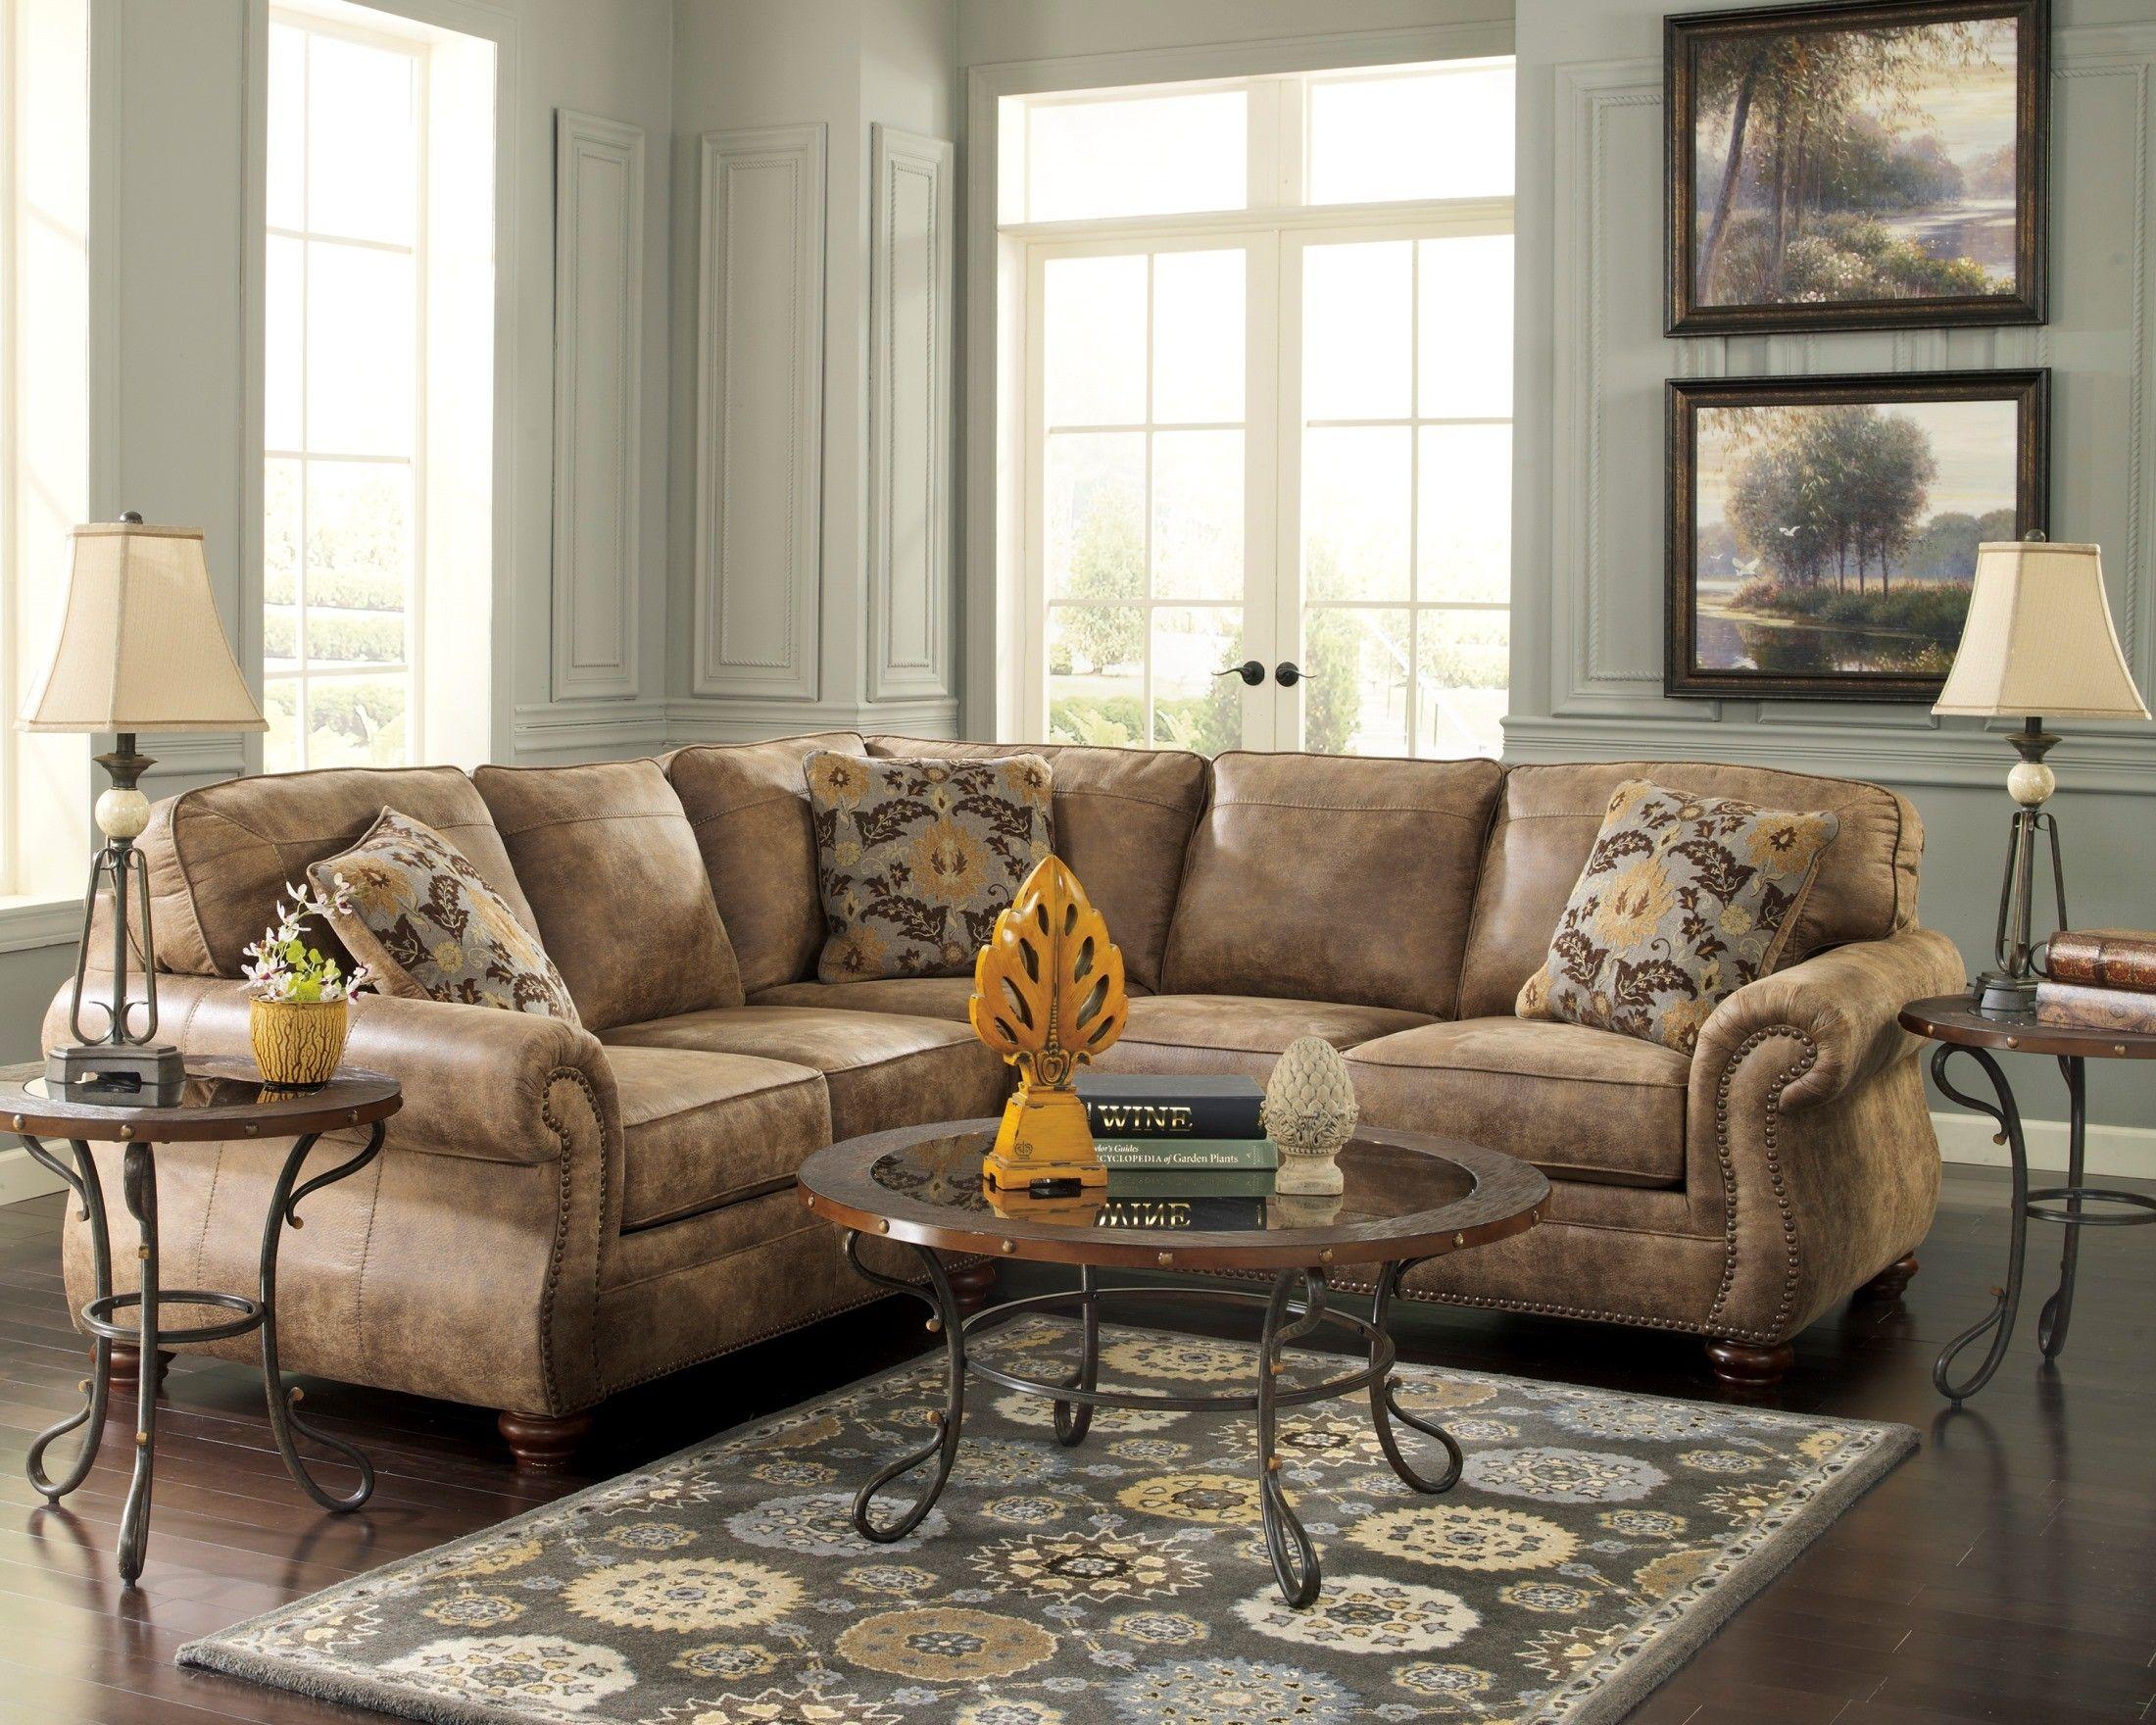 Sofas For Sale Get Living Room Sofas Furniture Ashley Furniture Sectional Living Room Sets Living room sets for sale near me